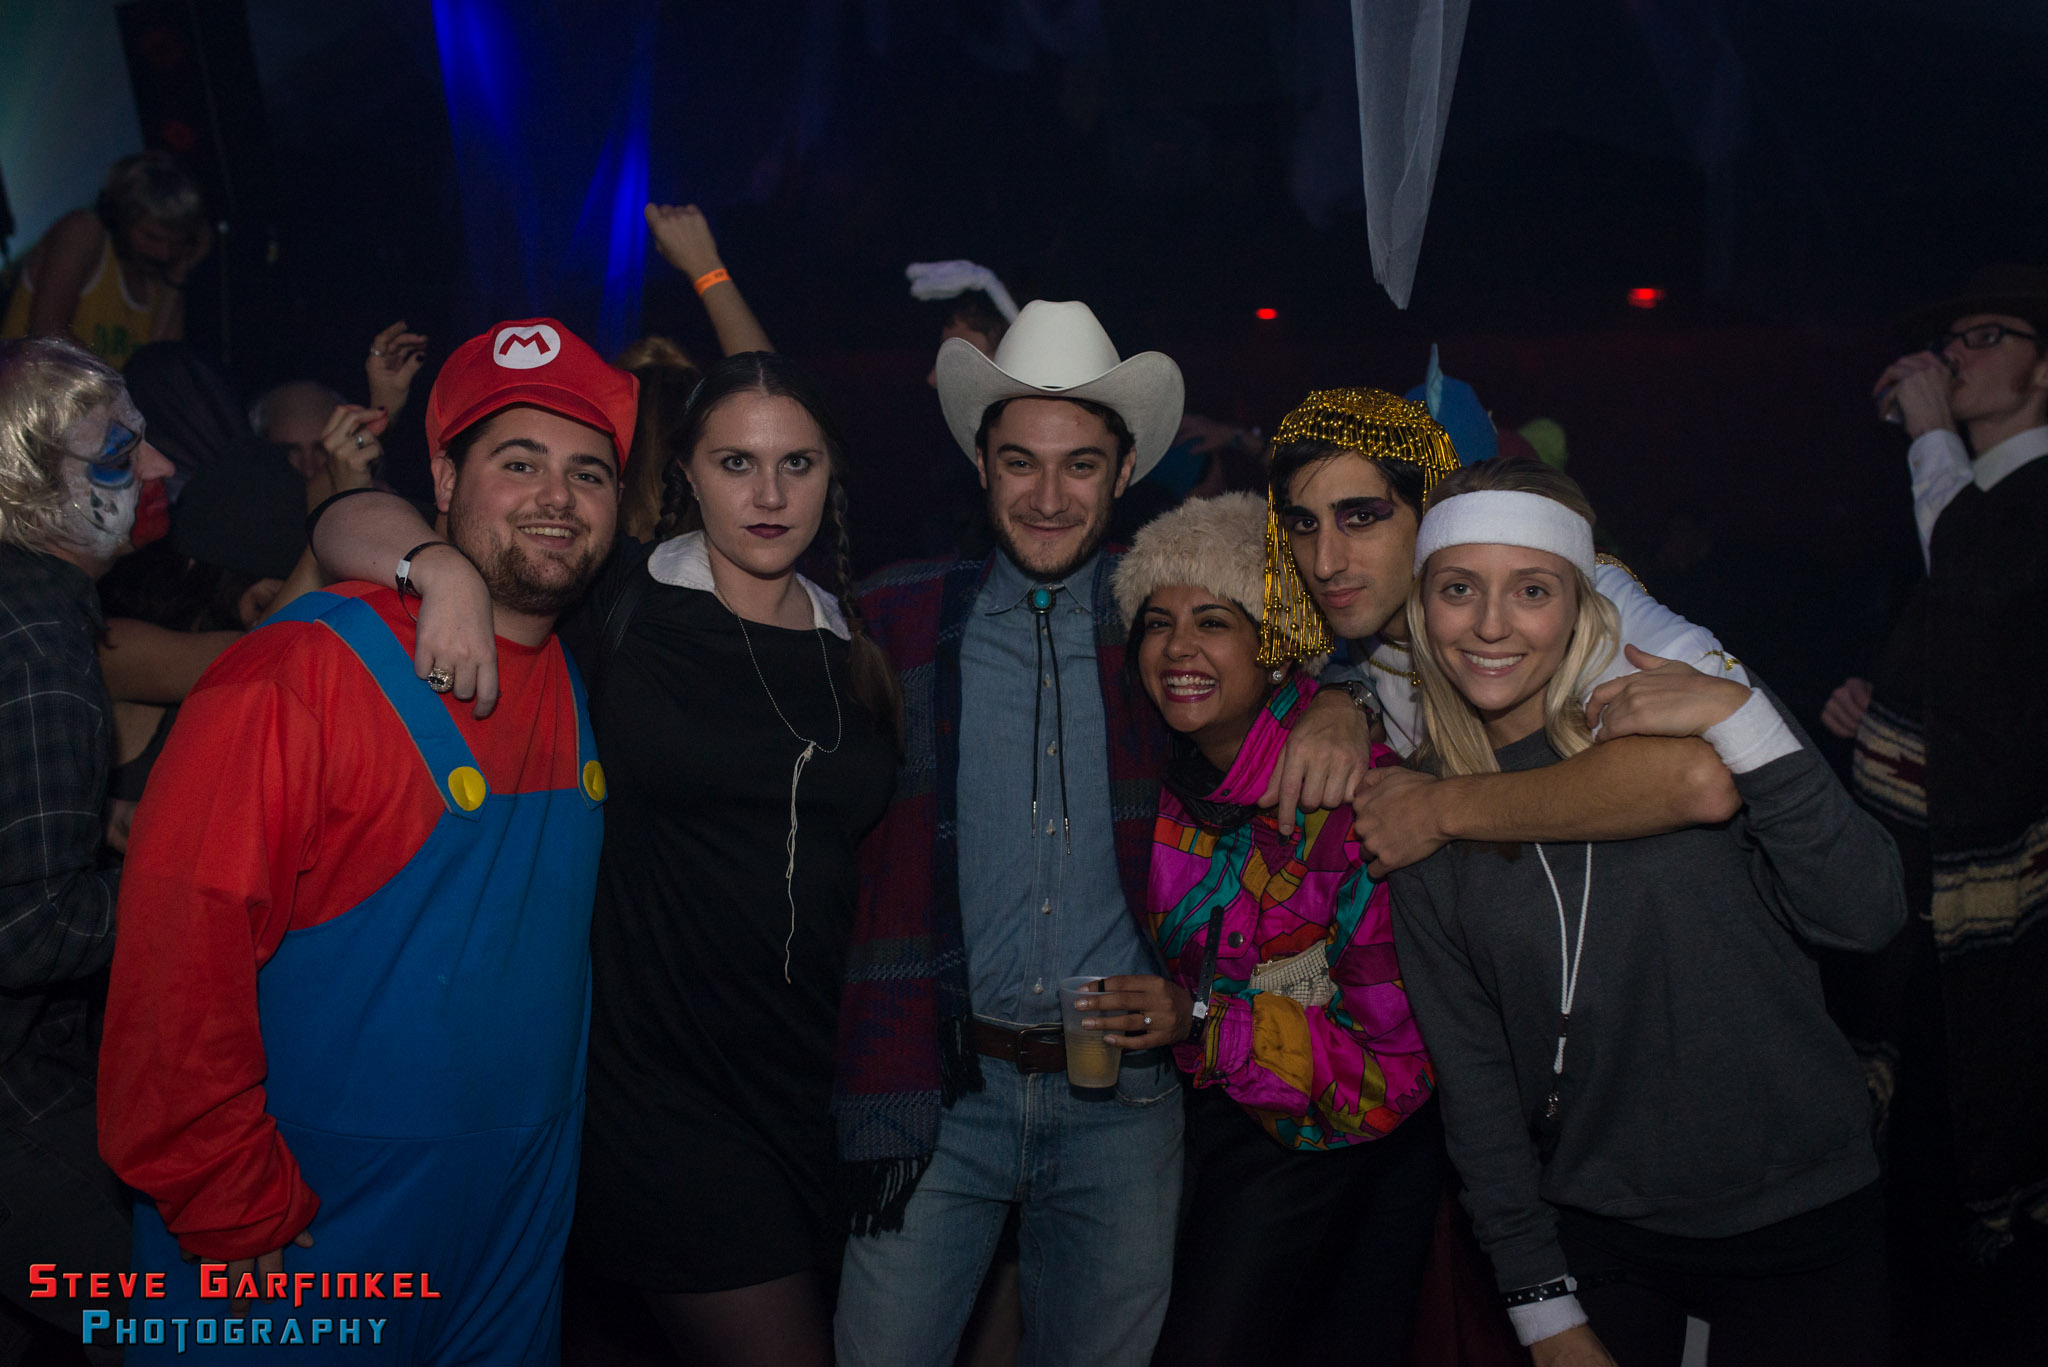 Halloween Night in Philly at Voyeur Nightclub, Rumor and Ladder ...